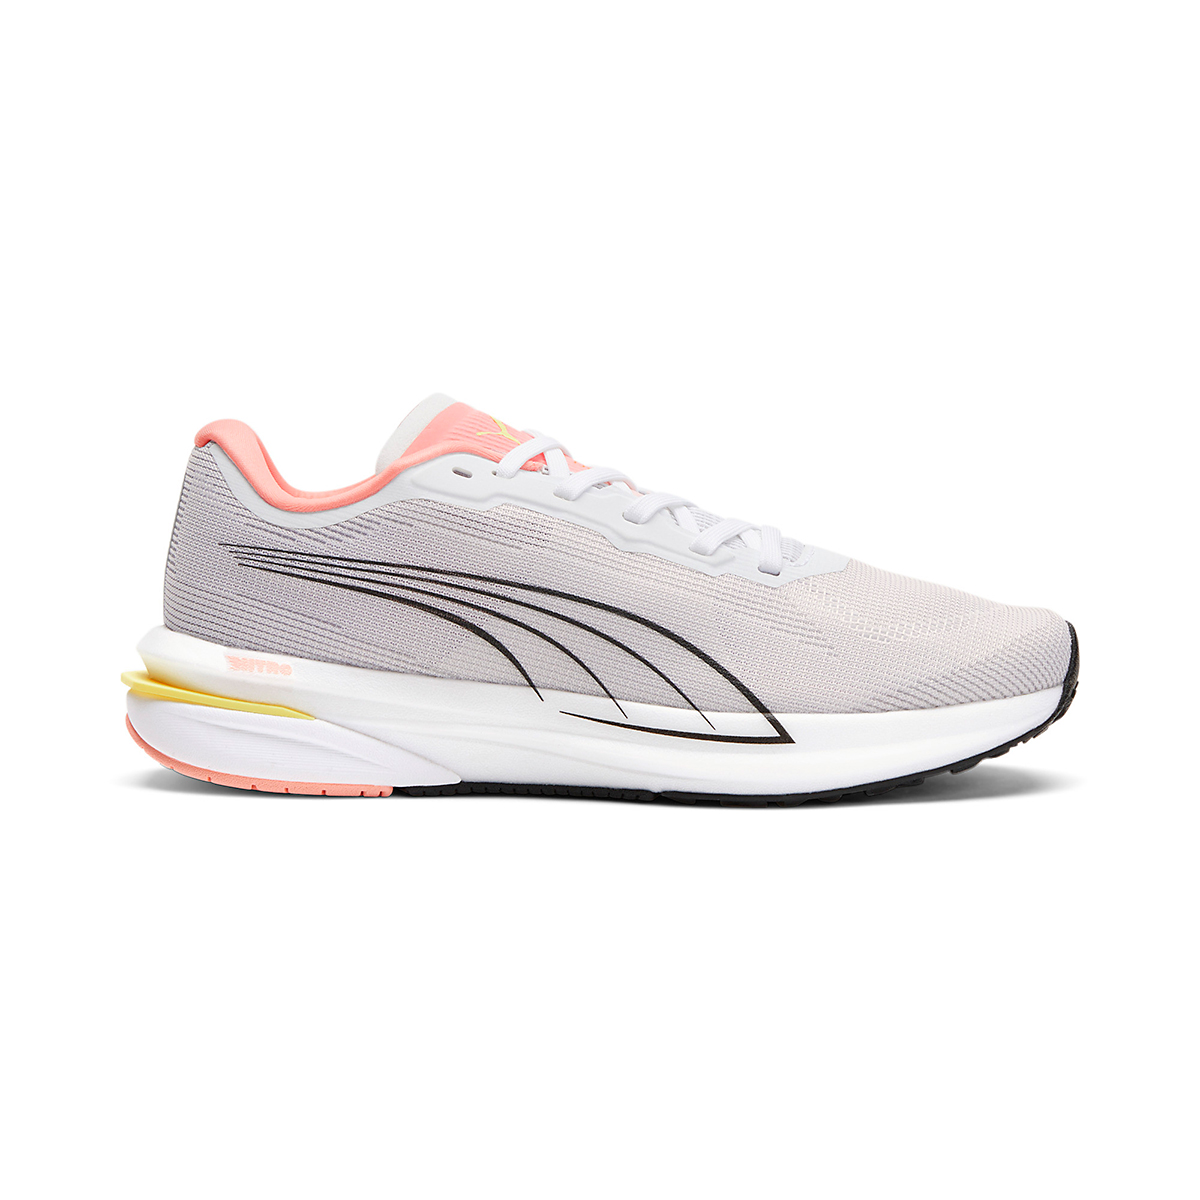 Women's Puma Velocity Nitro Running Shoe - Color: Puma White - Size: 5.5 - Width: Regular, Puma White, large, image 1